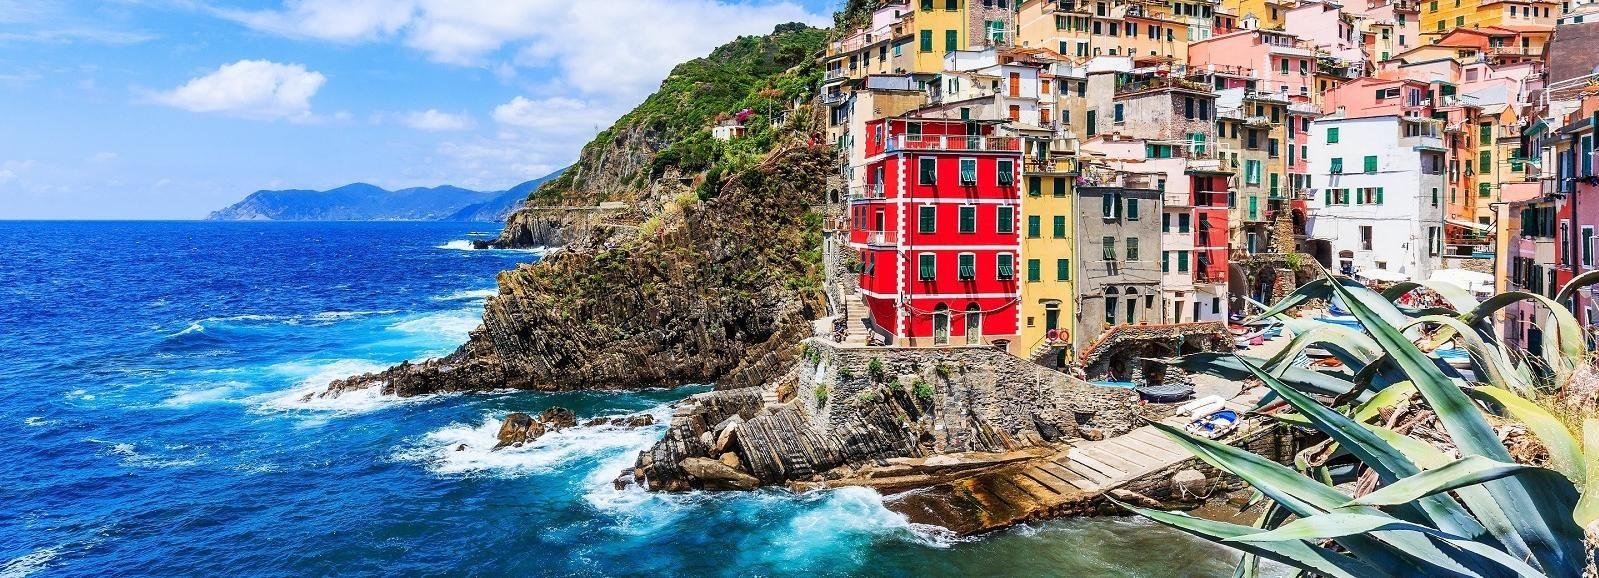 Ab Florenz: Cinque Terre - Hin- und Rücktransfer